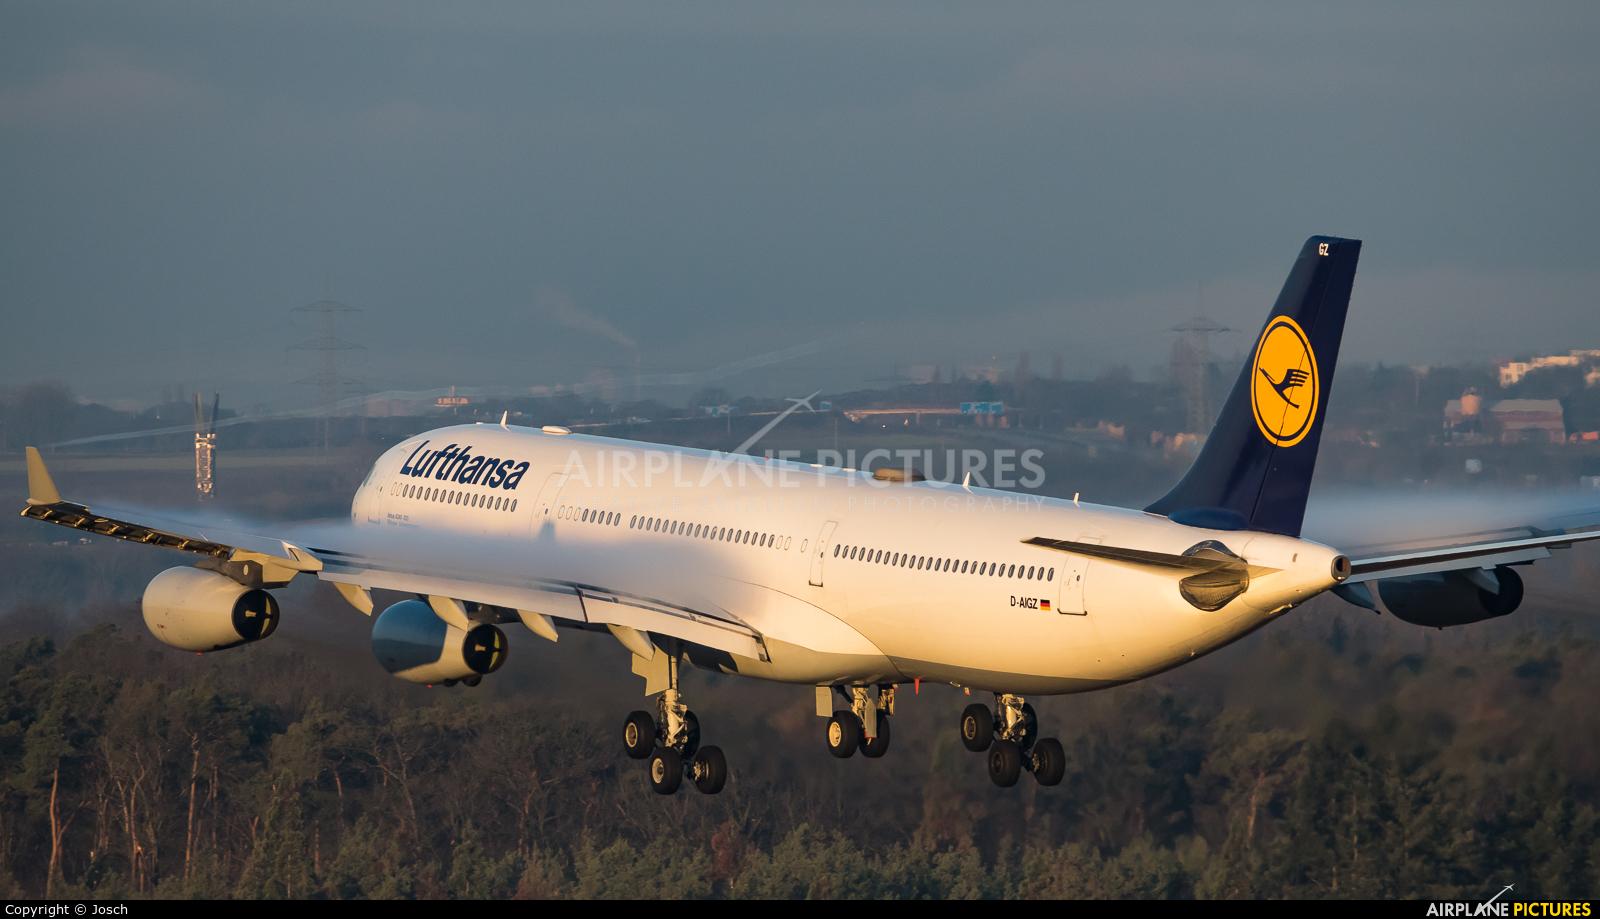 Lufthansa D-AIGZ aircraft at Frankfurt